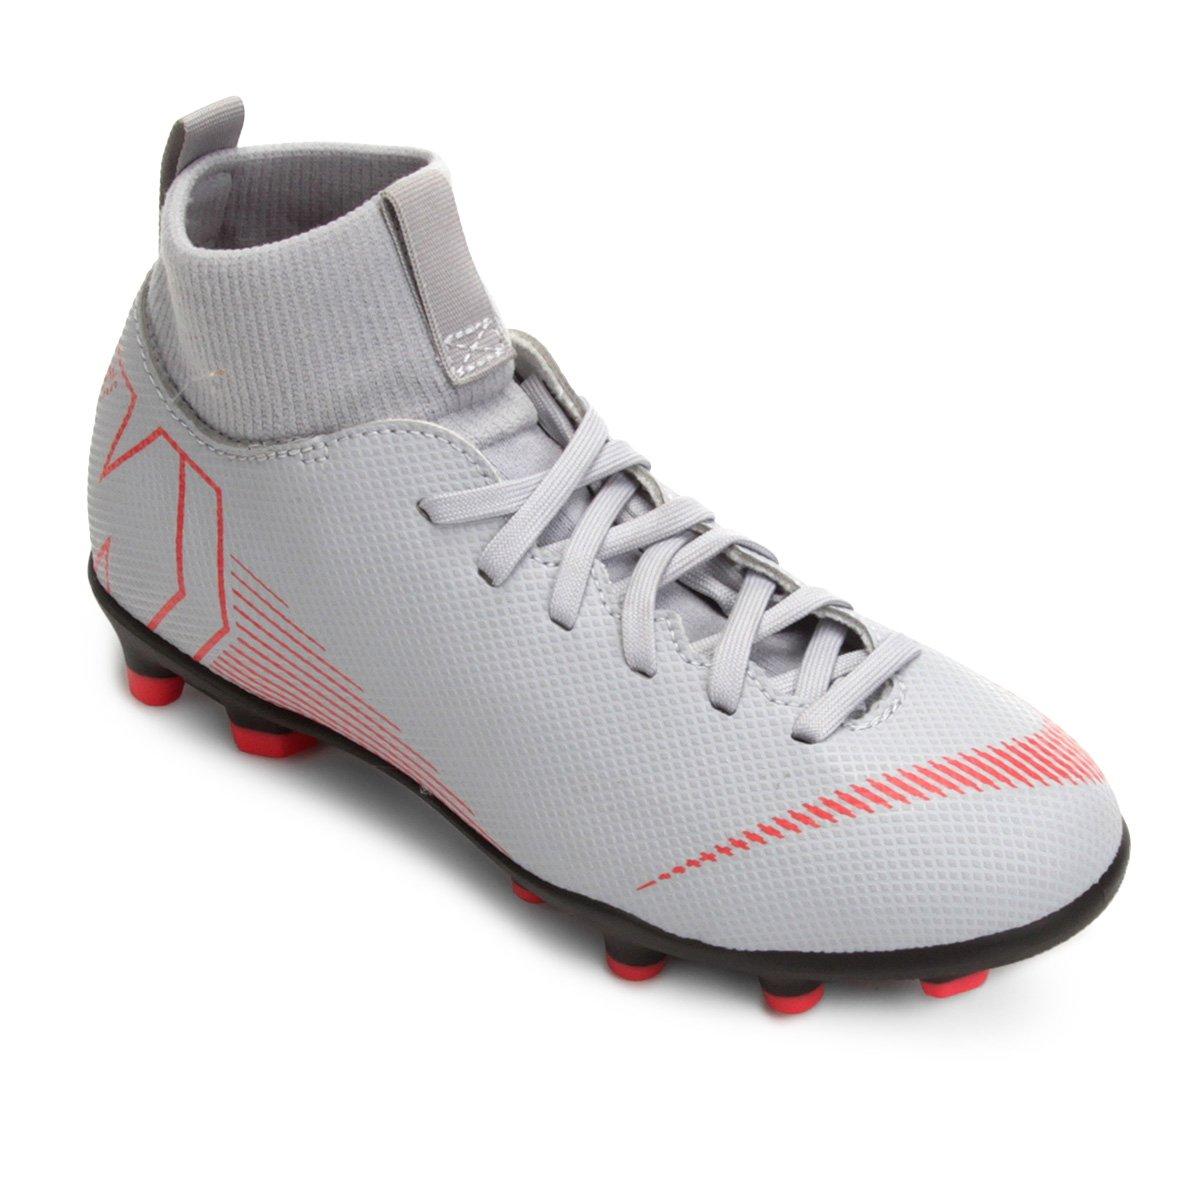 f3dd30c842 Shopping Smiles - Chuteira Campo Infantil Nike Mercurial Superfly 6 Club